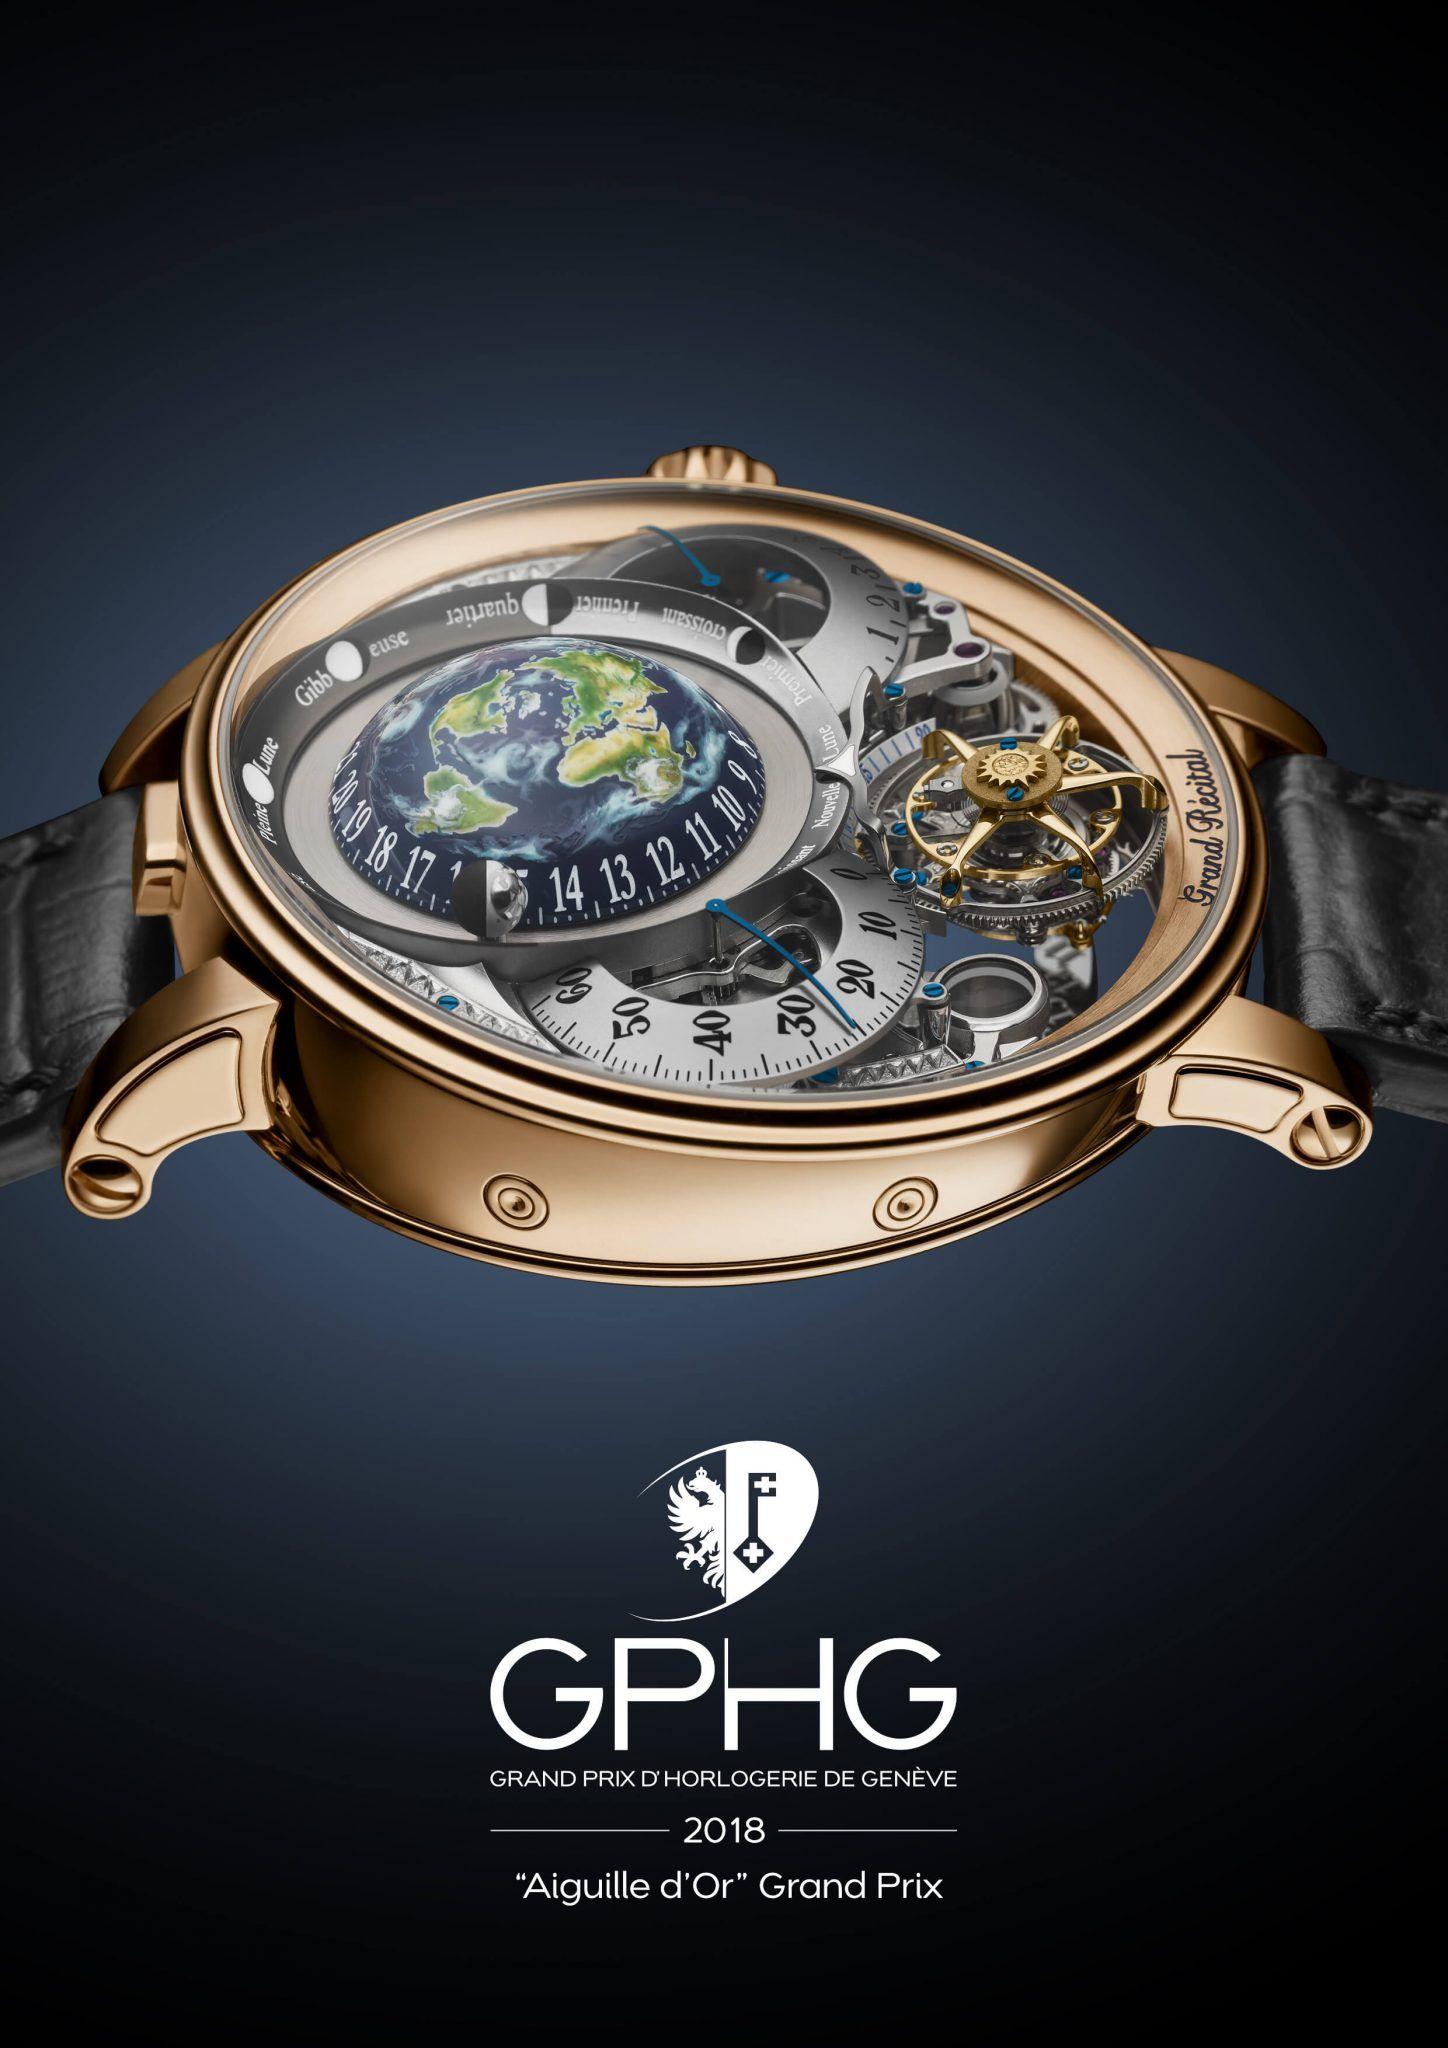 Bovet Grand Recital Aiguille d'Or blog debajo del reloj